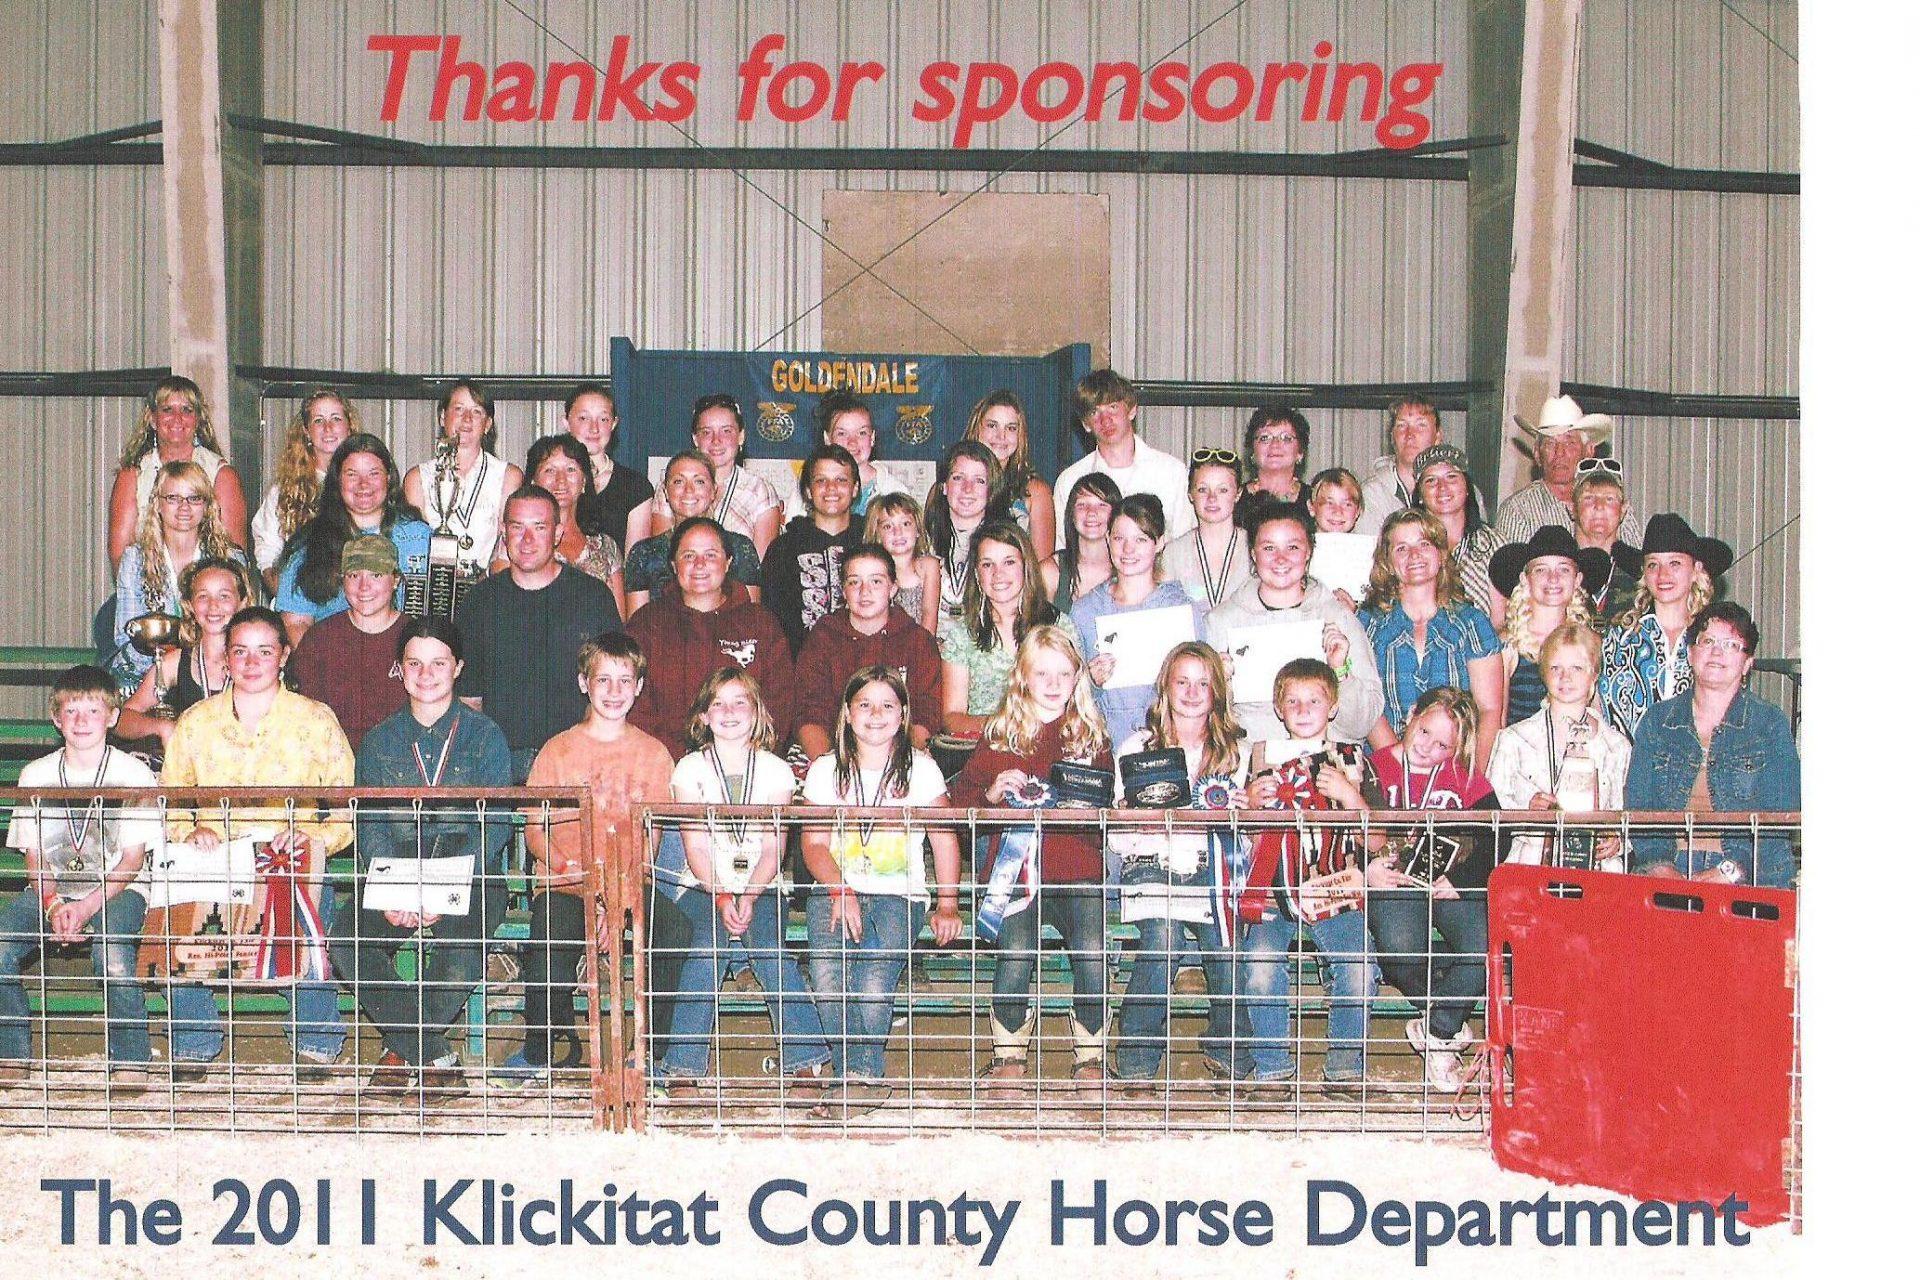 Klickitat County Sponsoring